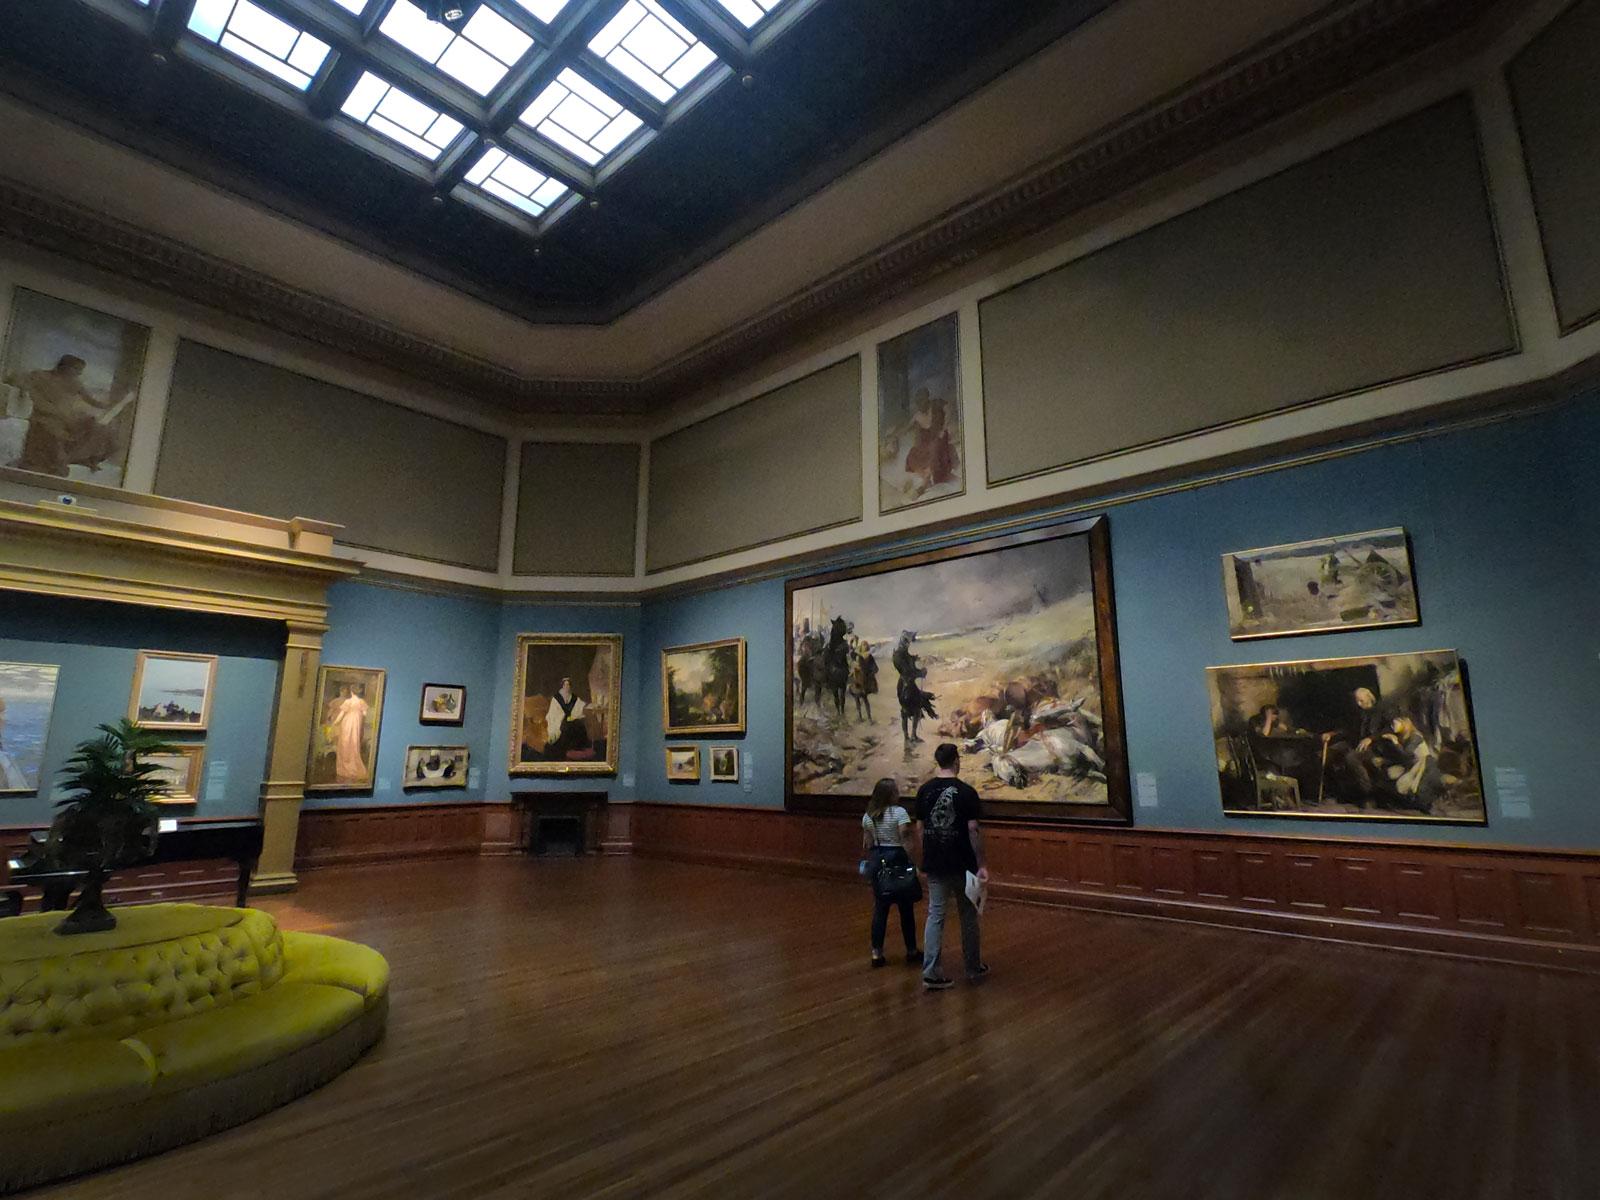 Interior of Telfair Academy art collection in Savannah, Georgia